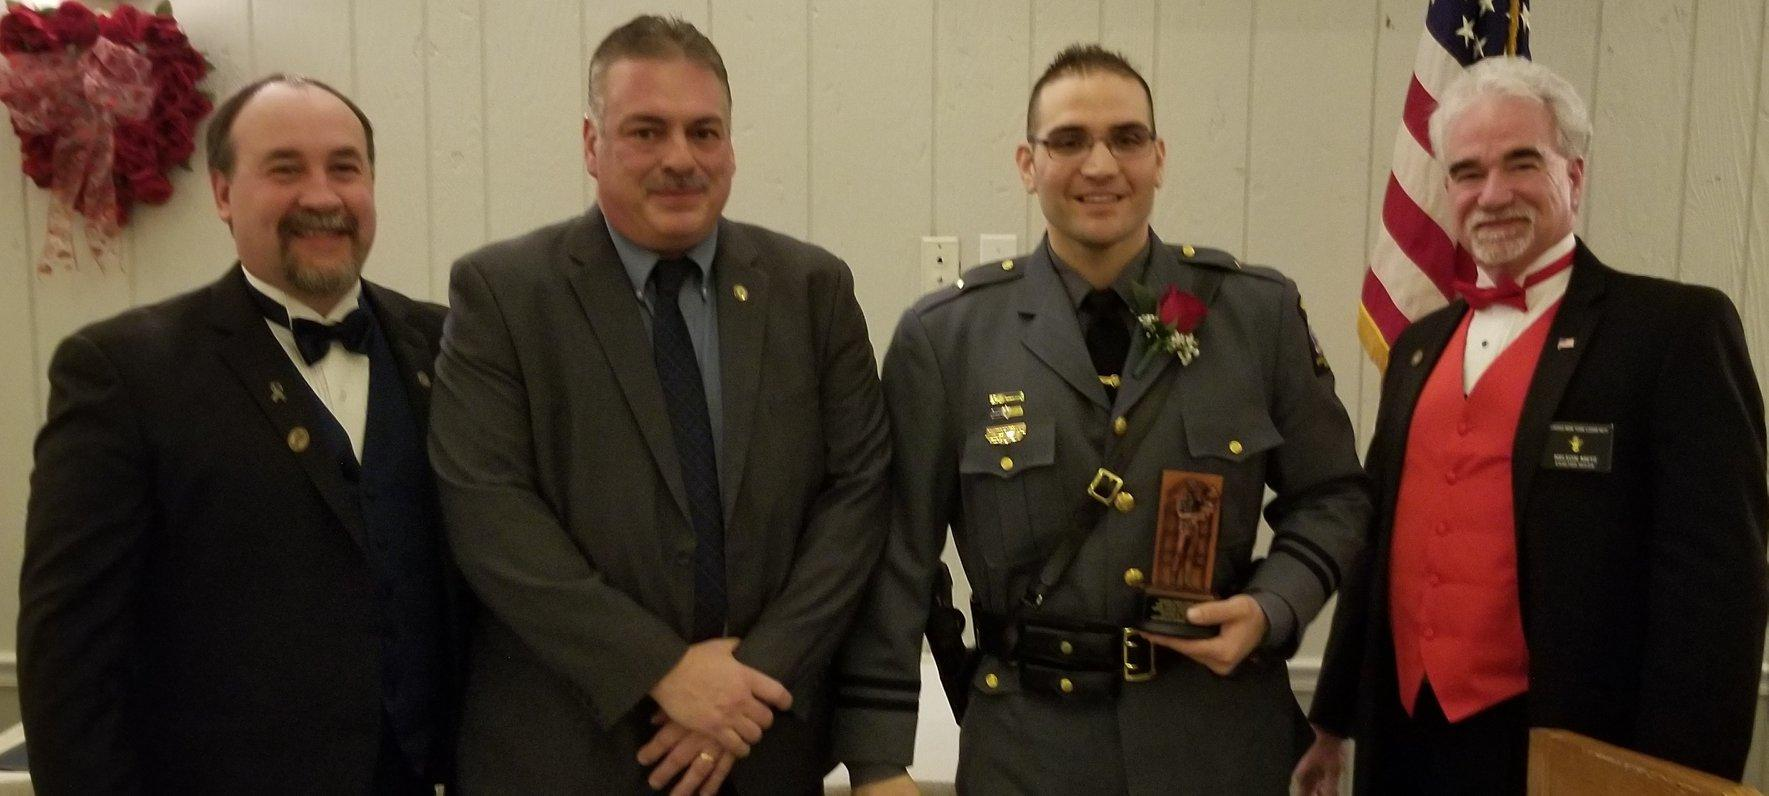 Oswego Elks award Lt. Robert Vaccarelli University Police Officer of the Year award